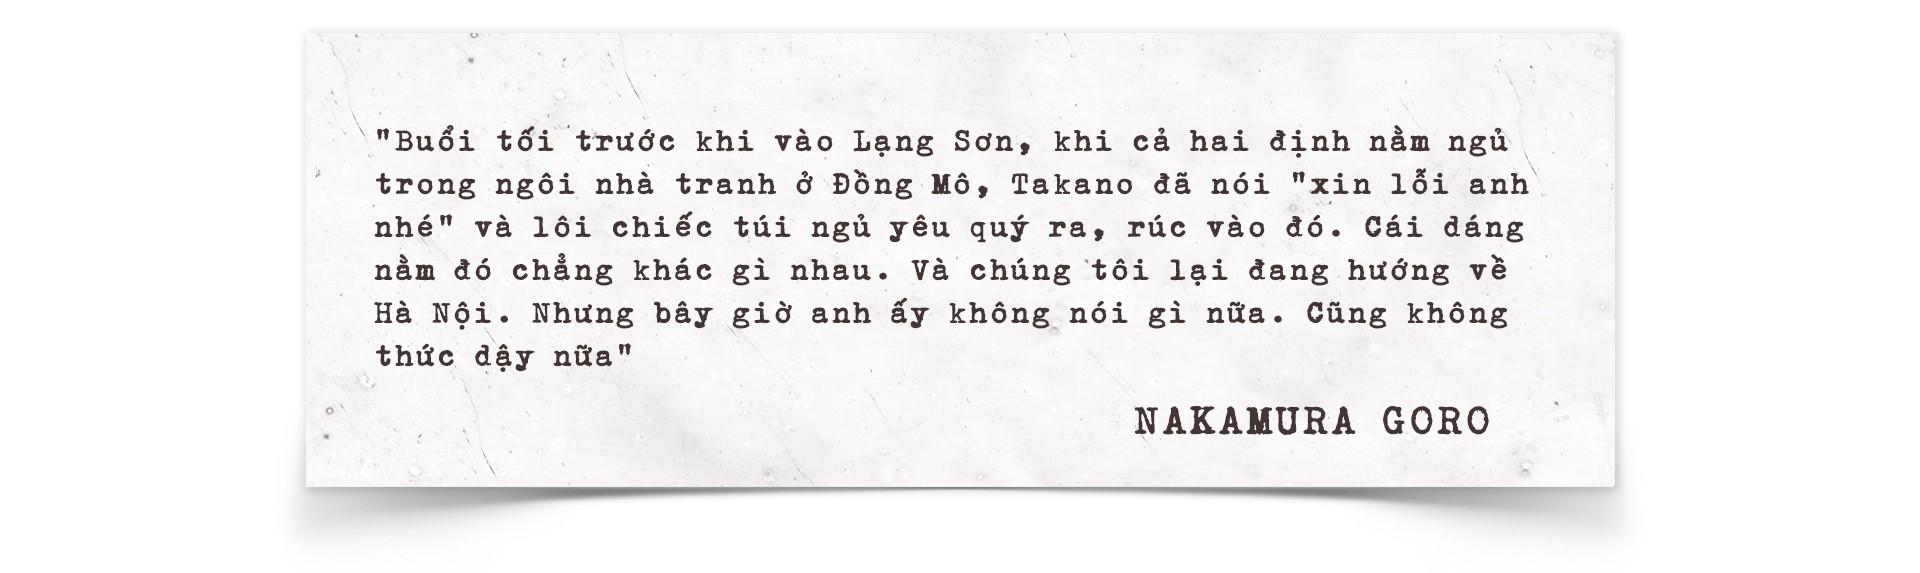 Kỳ 3: Cái chết của Takano - Ảnh 9.